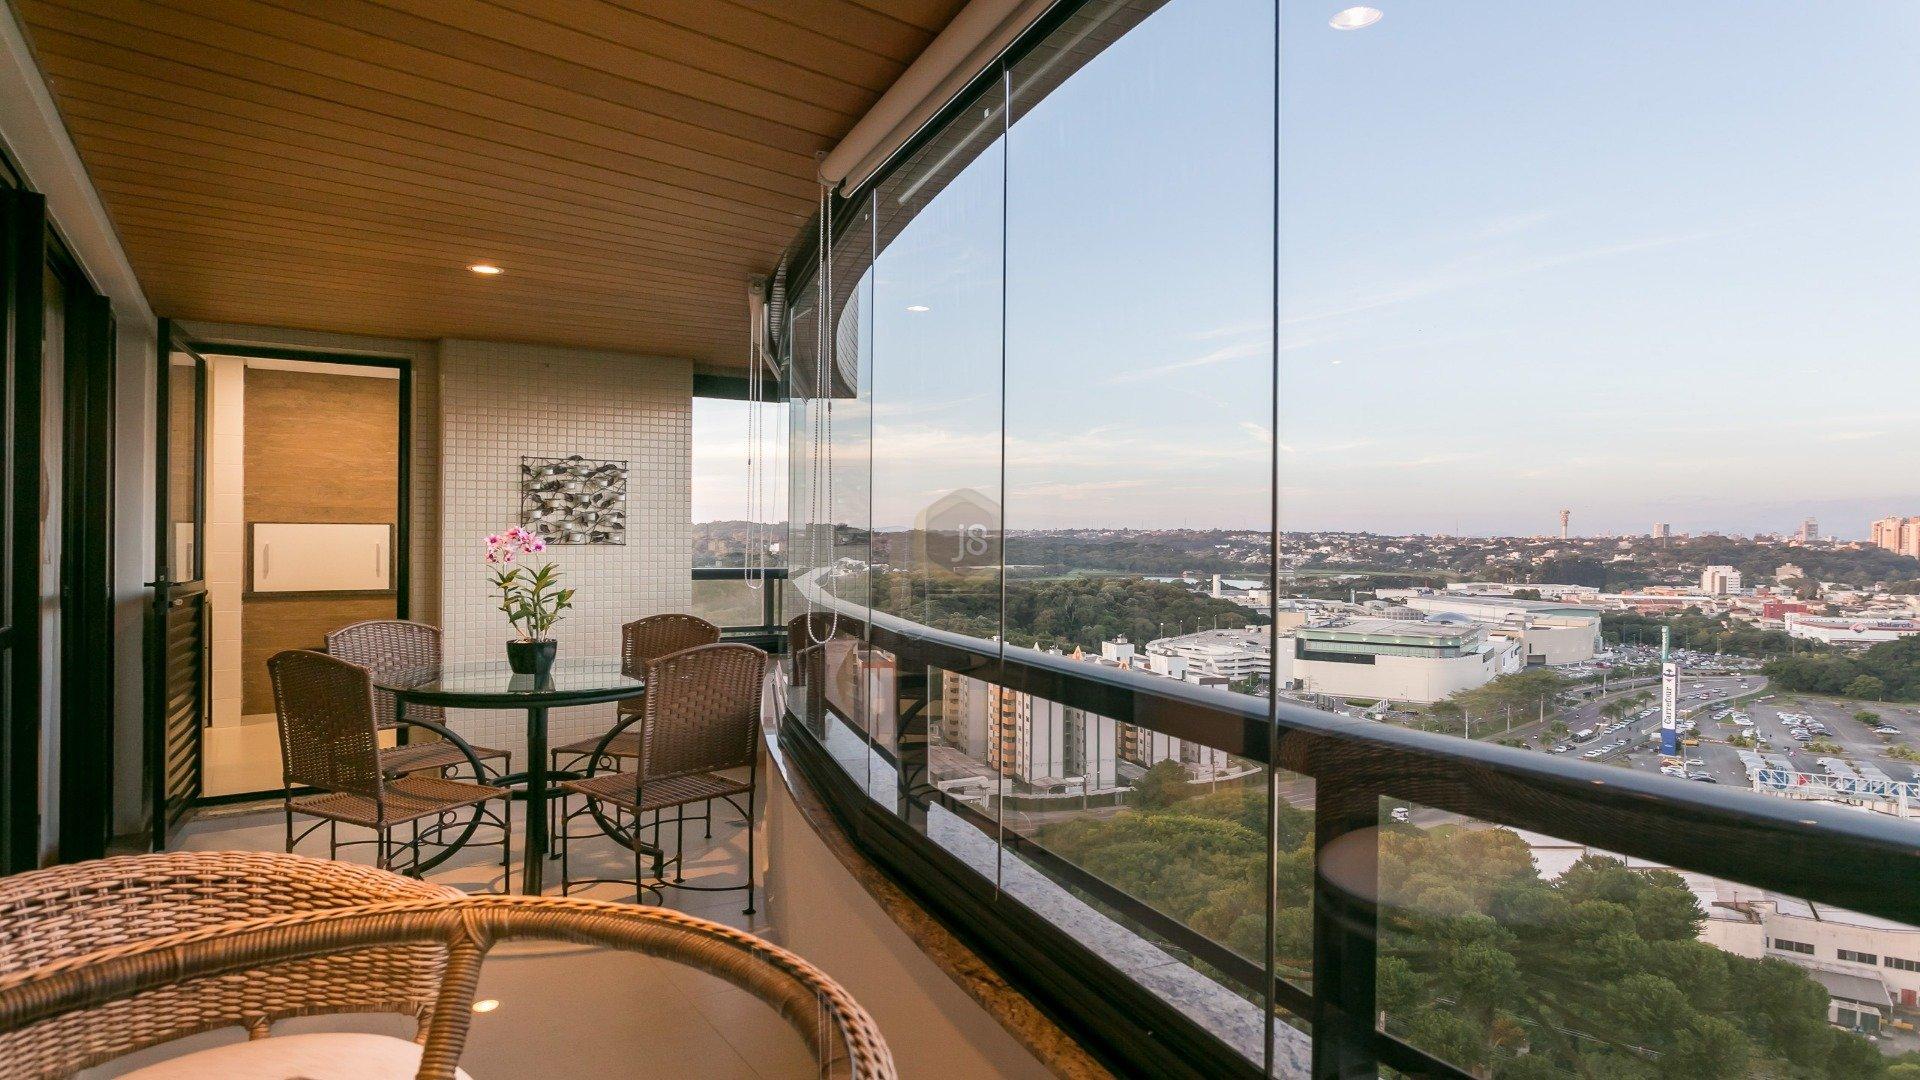 Foto de destaque Apartamento 3 suítes com  vista incrível no ecoville